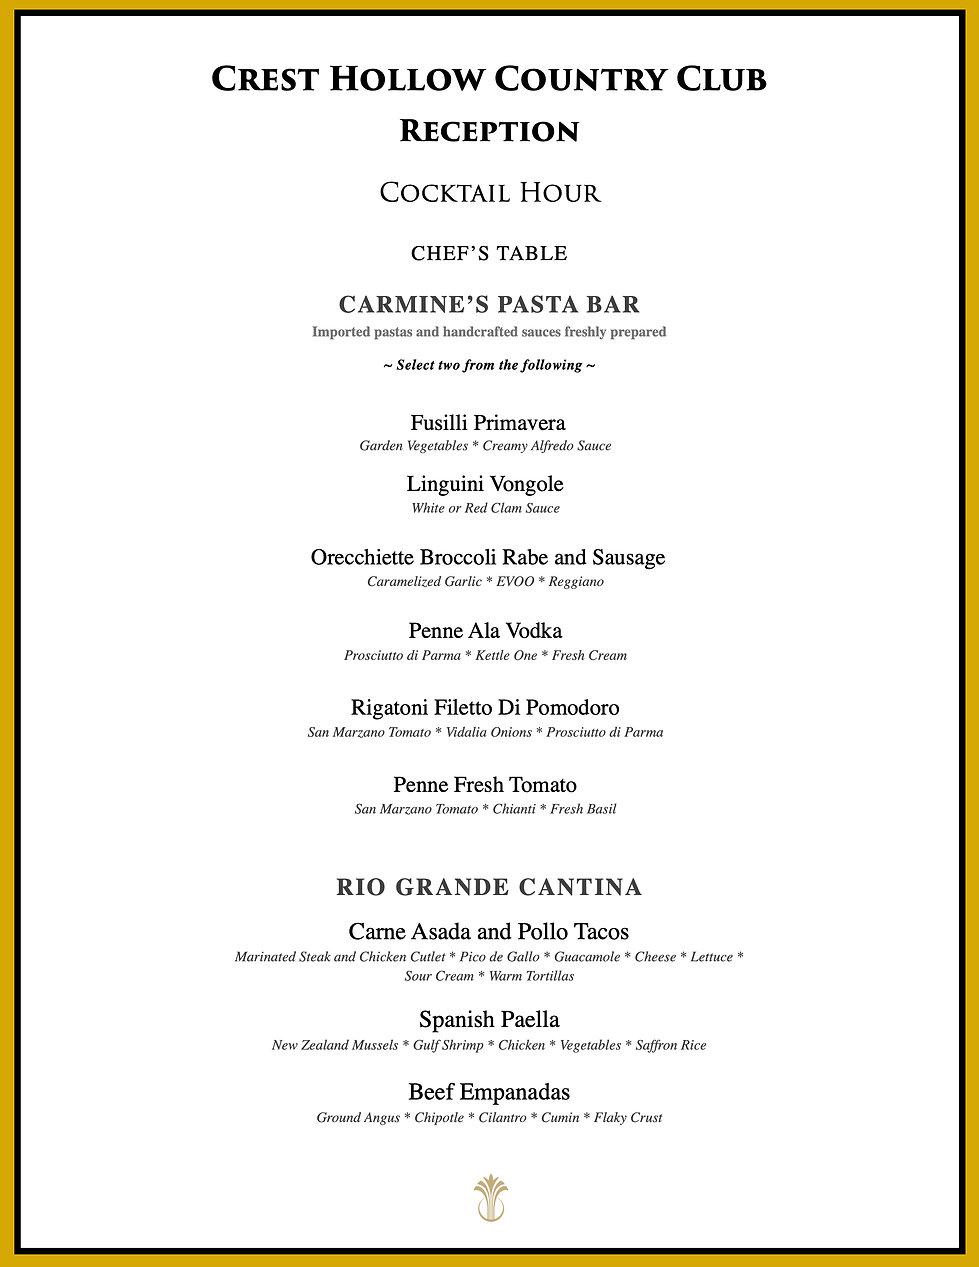 Reception Menu - Page 3.jpg